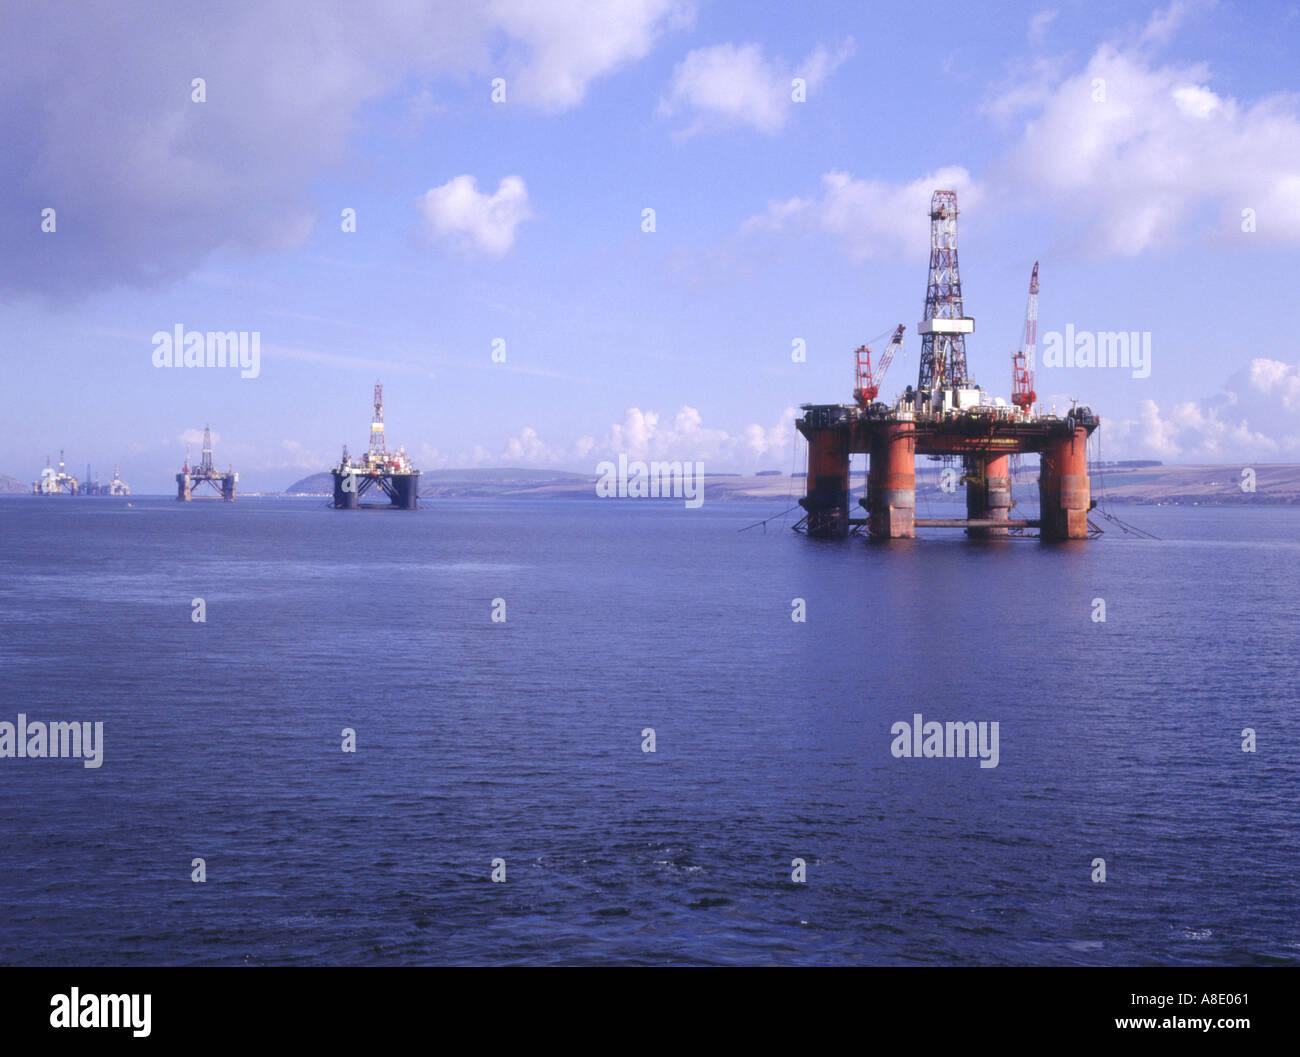 dh Oil rig CROMARTY FIRTH ROSS CROMARTY oil platforms off invergordon scotland uk north sea platform Stock Photo